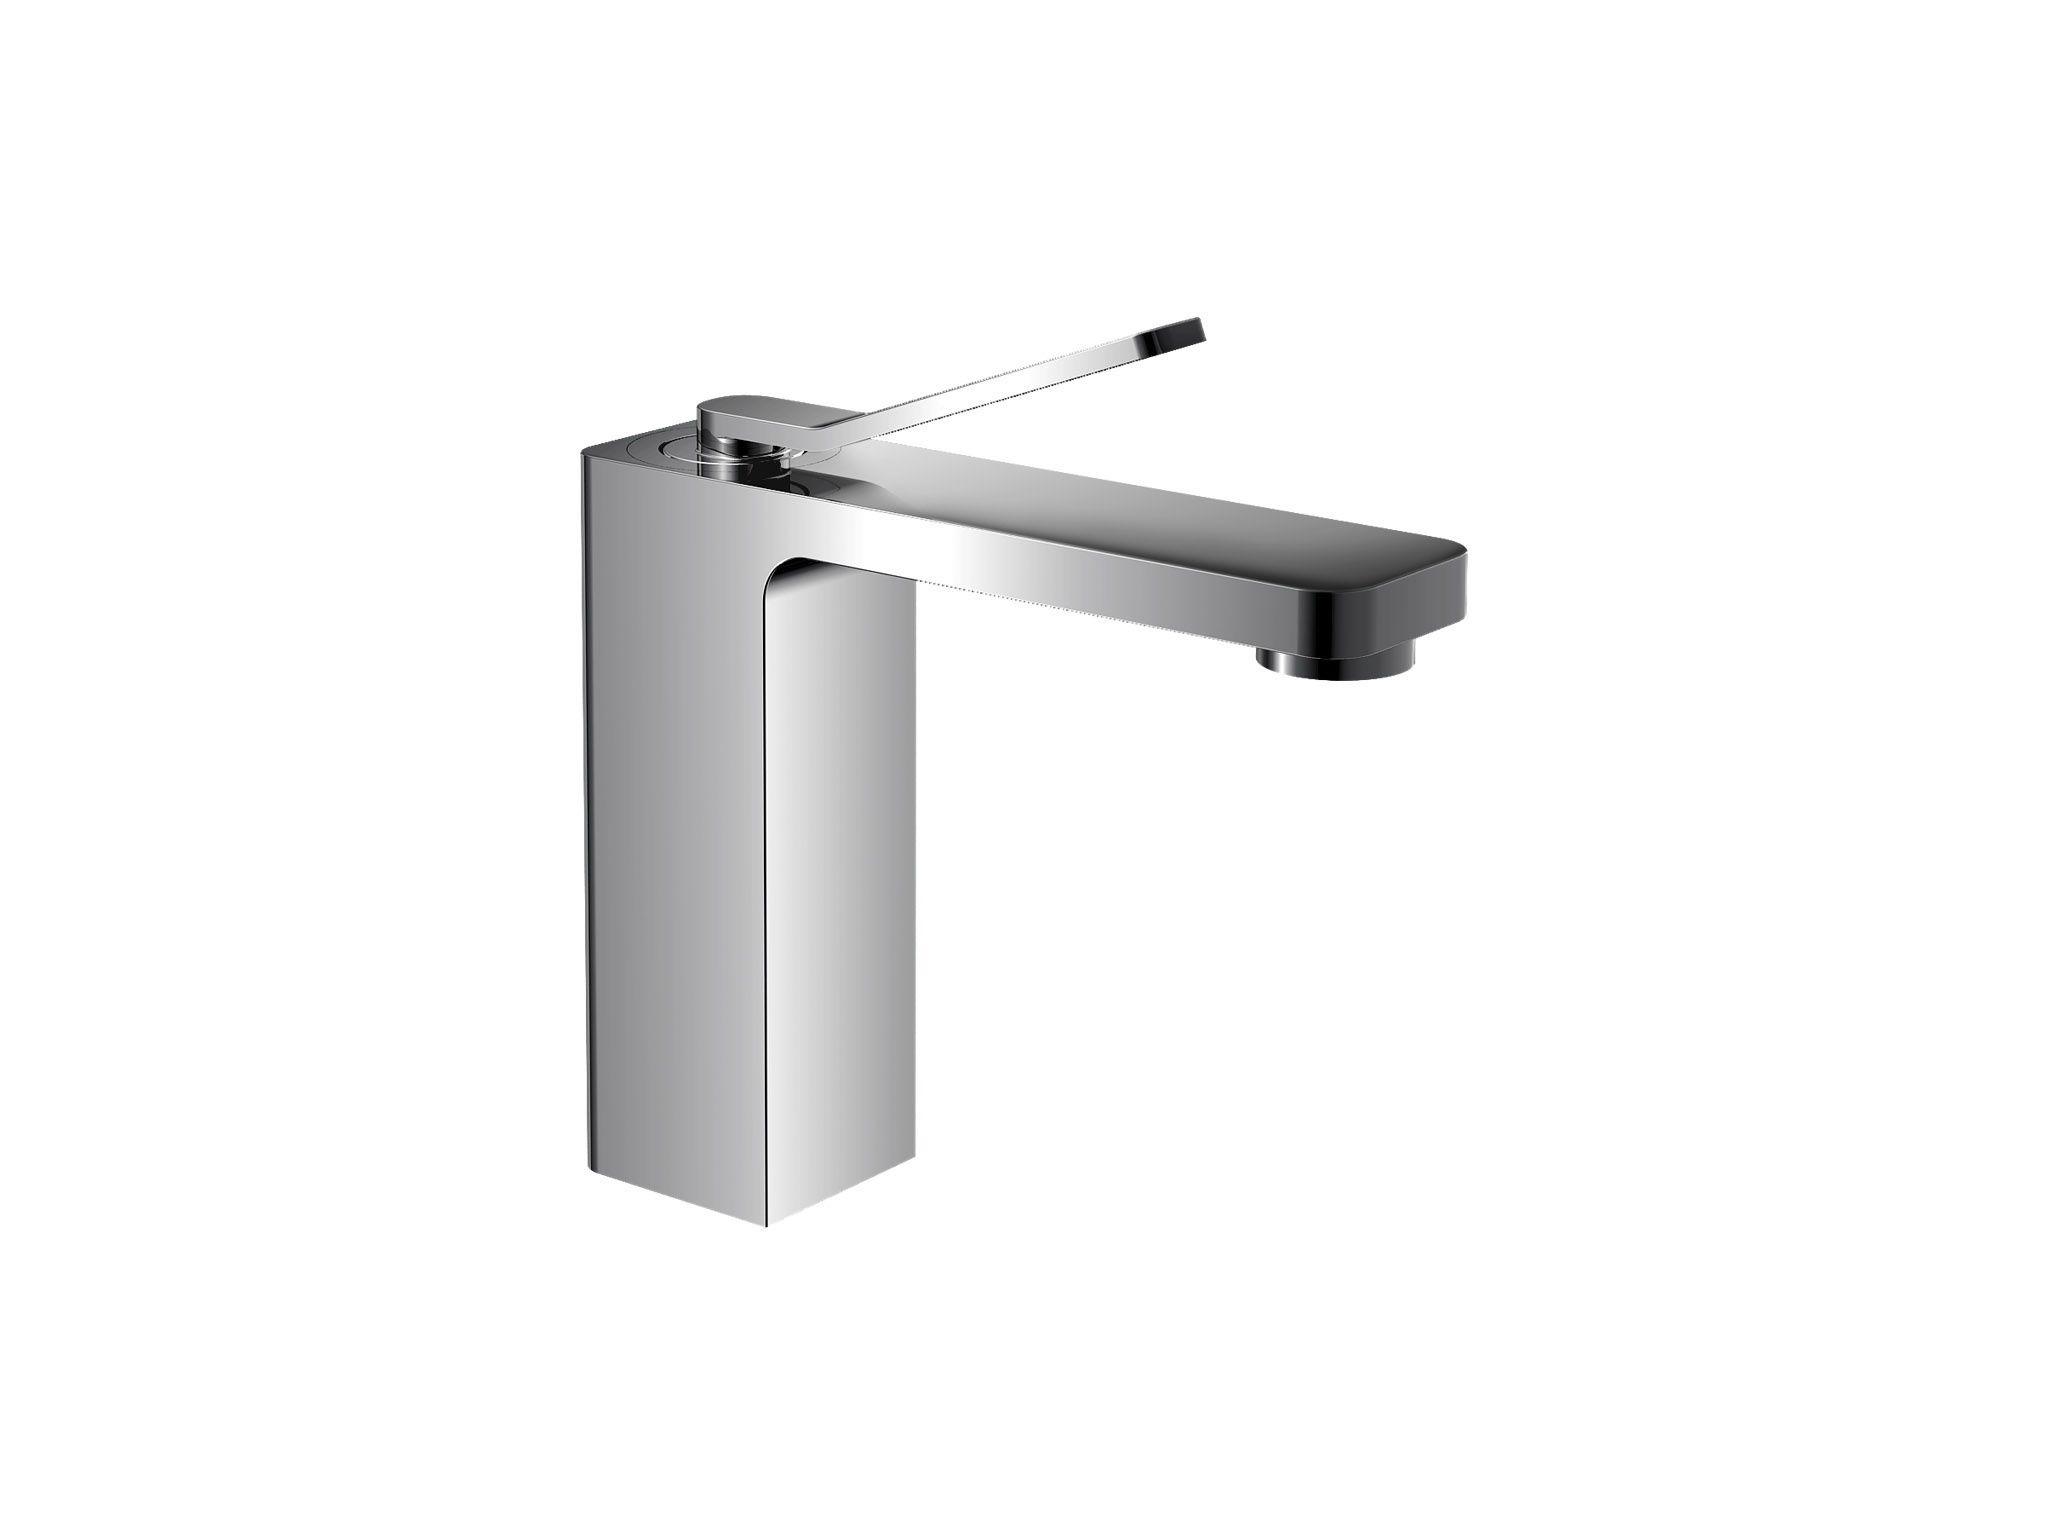 Siena monomando baja para lavabo cromo 1 mxp for Llaves modernas para lavamanos